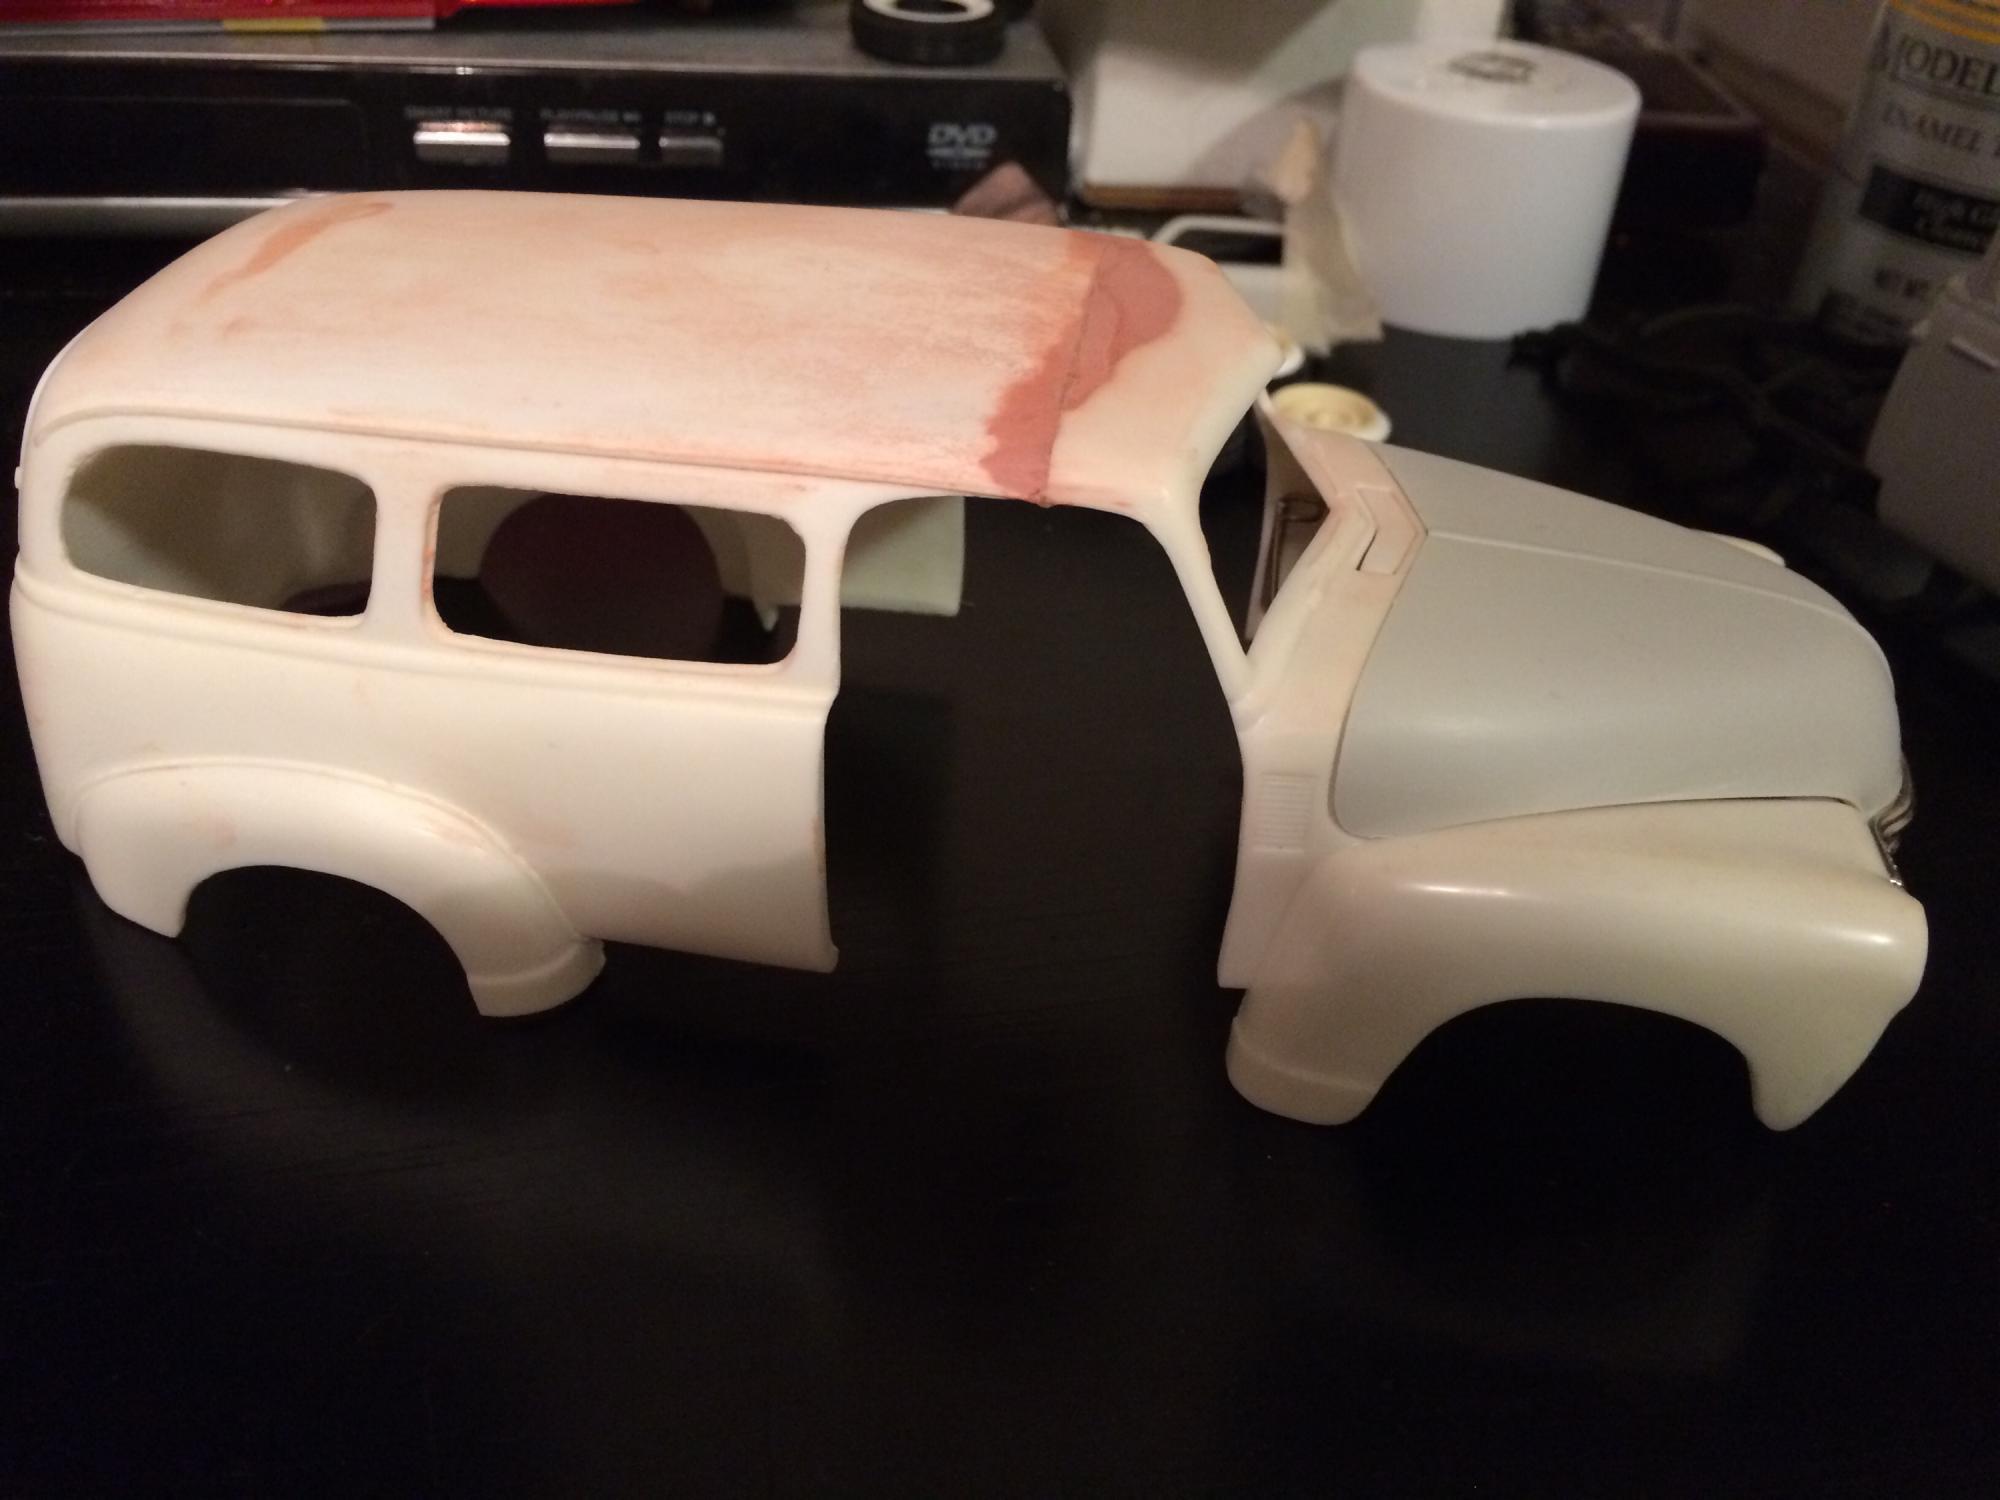 1950 Chevy Suburban - Under Glass: Pickups, Vans, SUVs